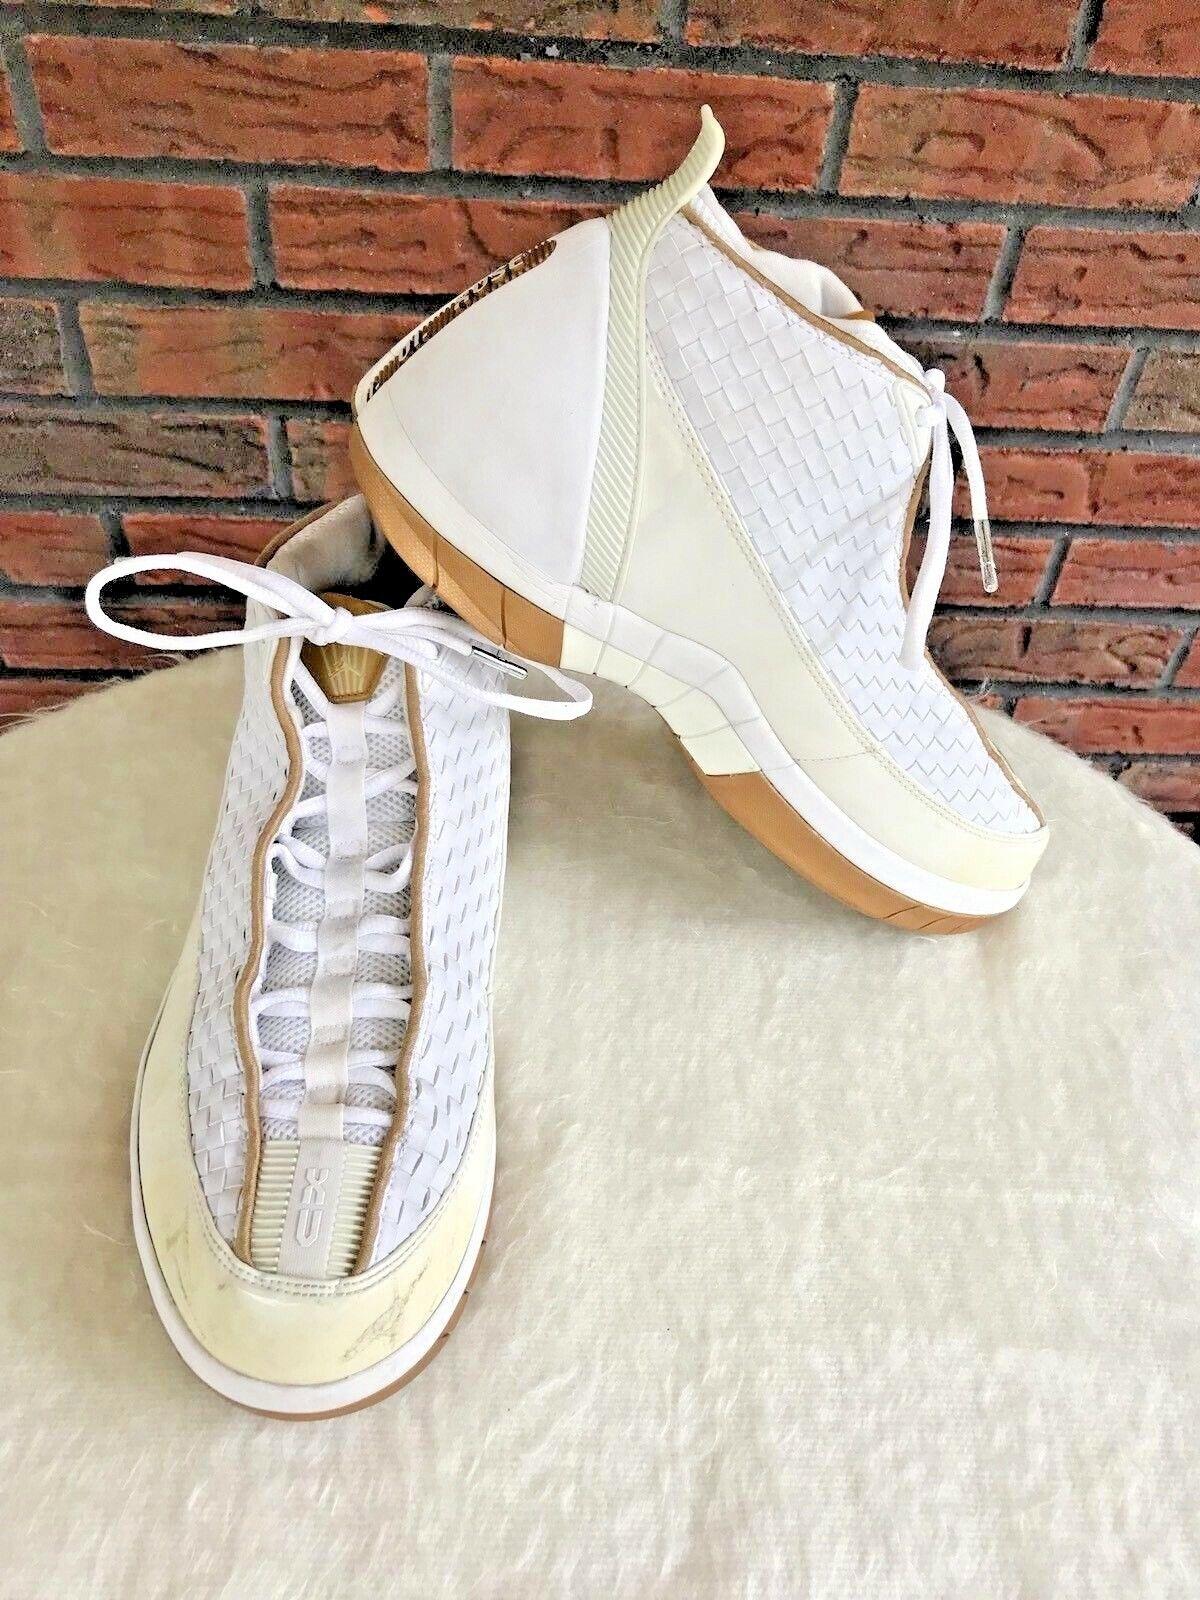 Nike Air Jordan XV SE Size 11.5 High Top Tennis shoes White gold Silver Leather